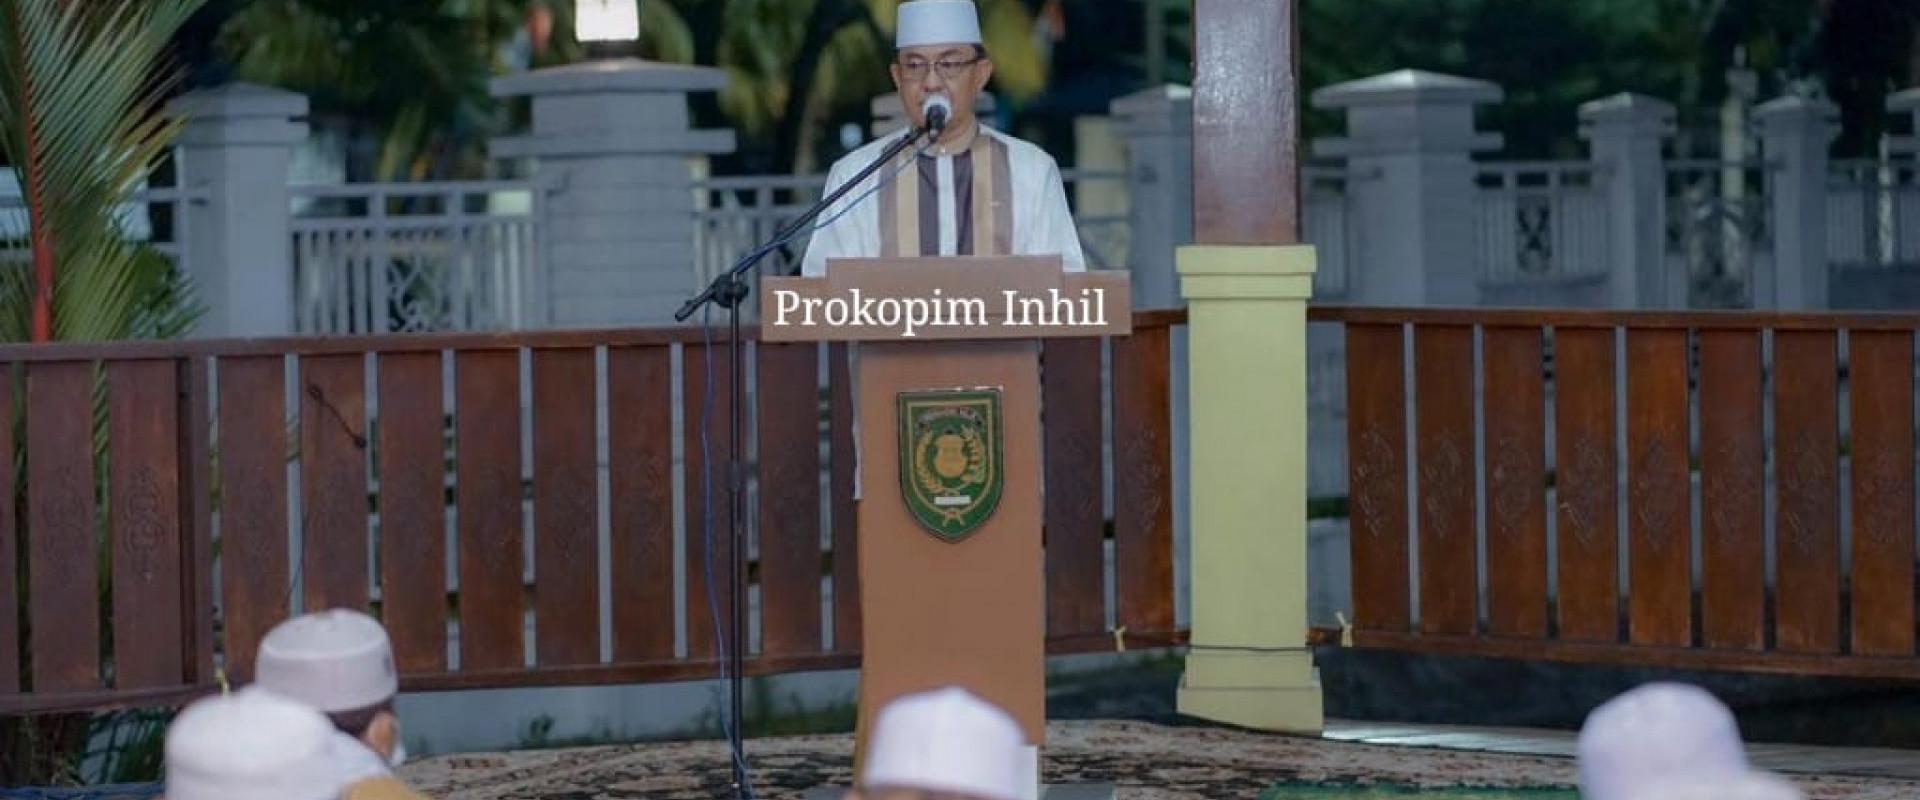 Ikuti gema takbir sambut hari Raya Idul Adha 1442 H, bupati Inhil : kokoh kan ukhuwah islamiyah